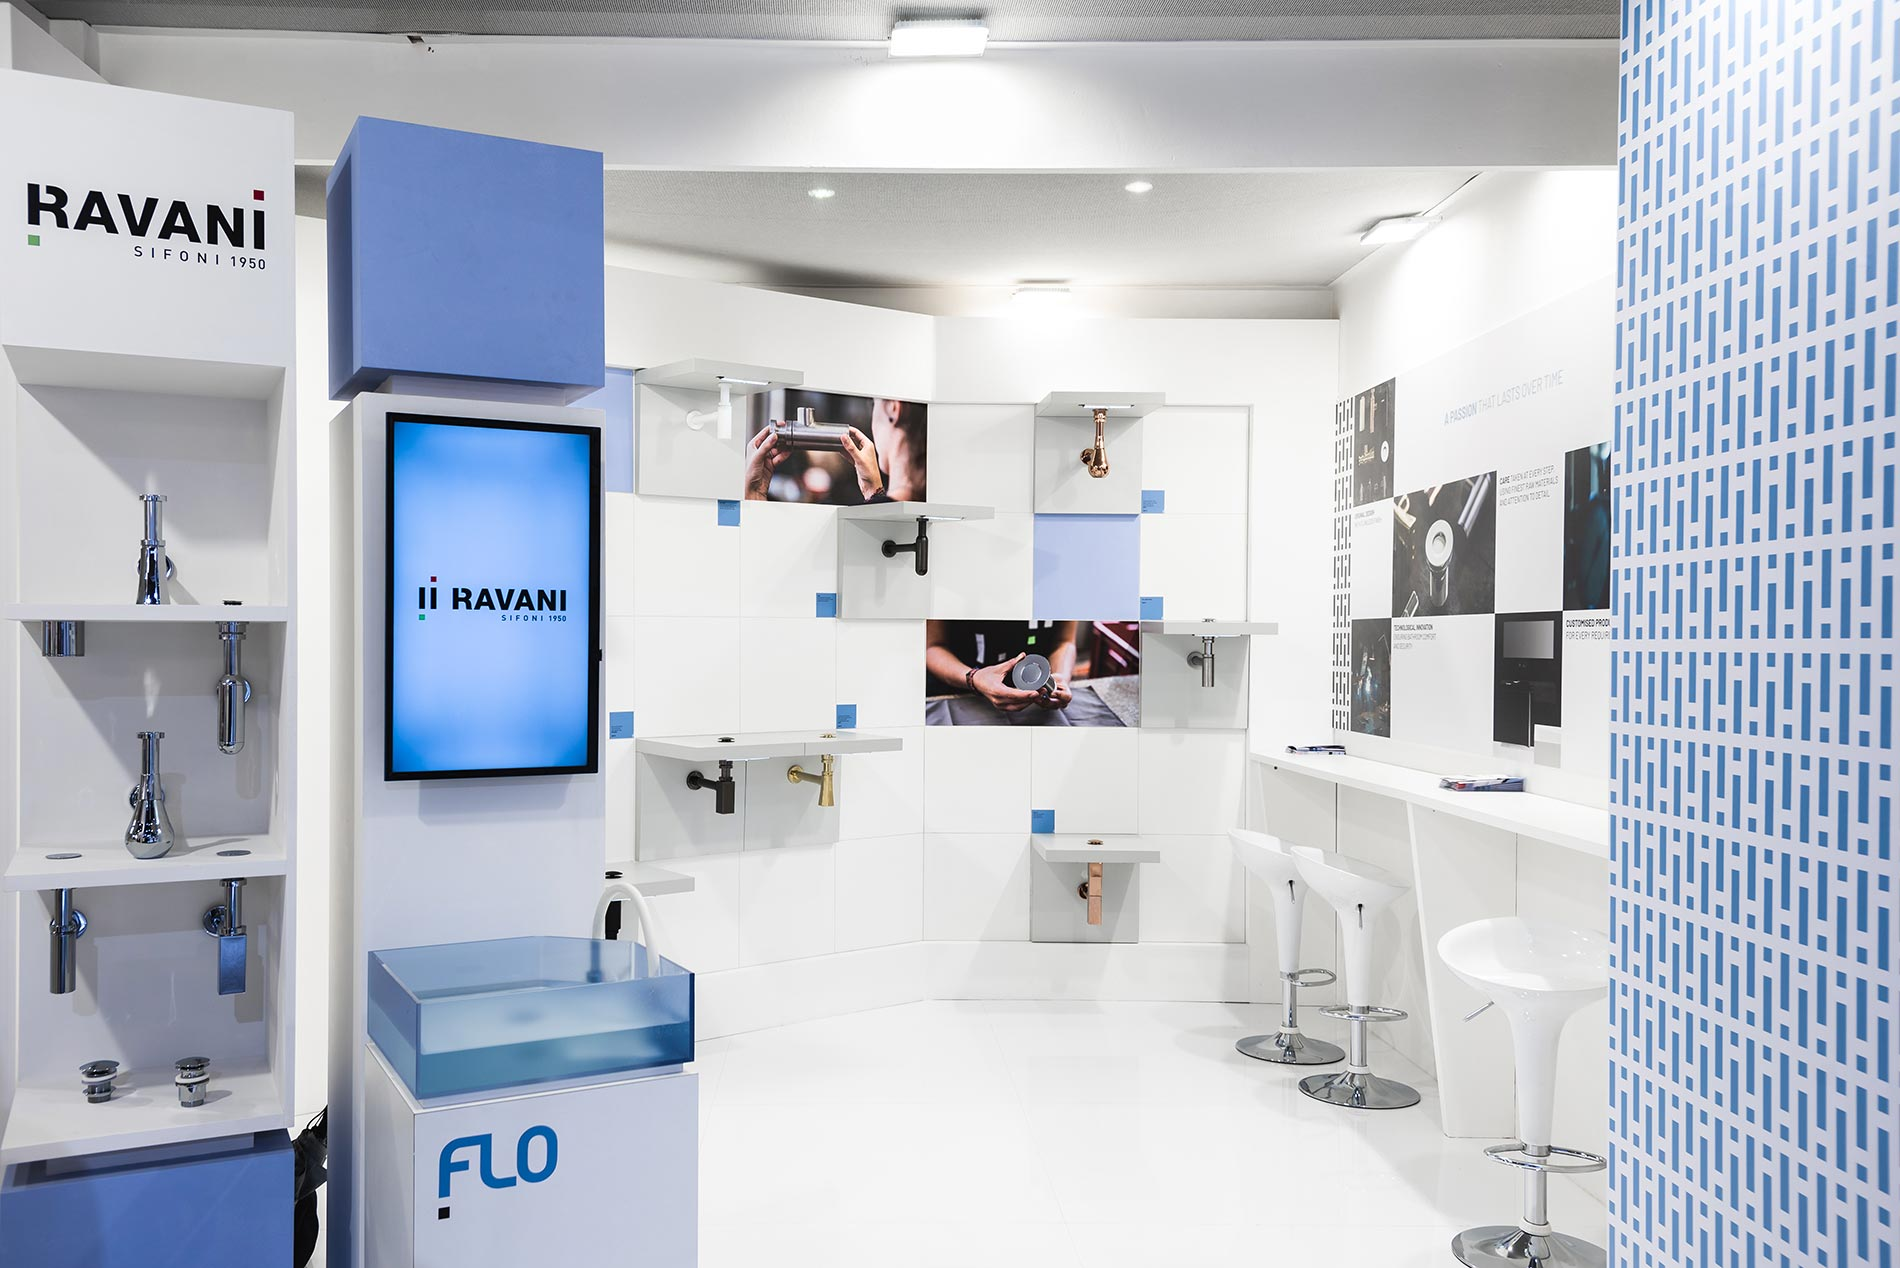 ravani sifoni ISH 2019 Frankfurt